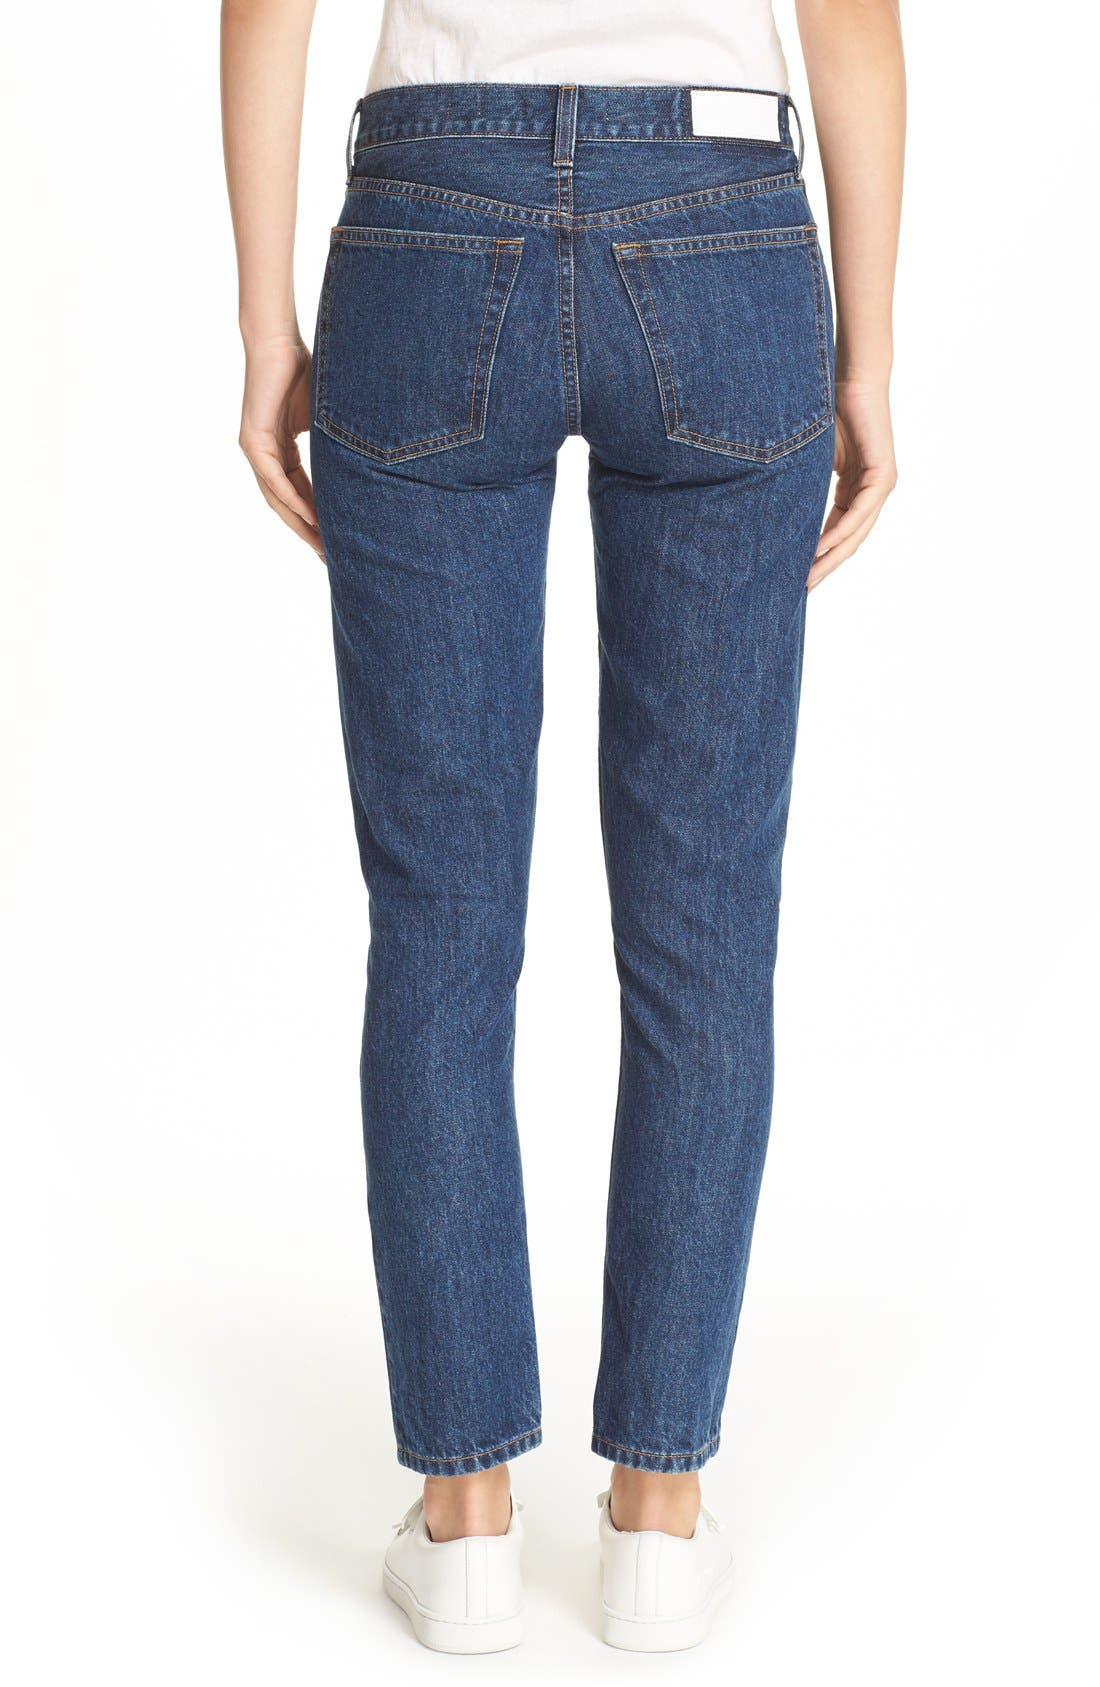 Alternate Image 2  - Re/Done 'Originals' Skinny Jeans